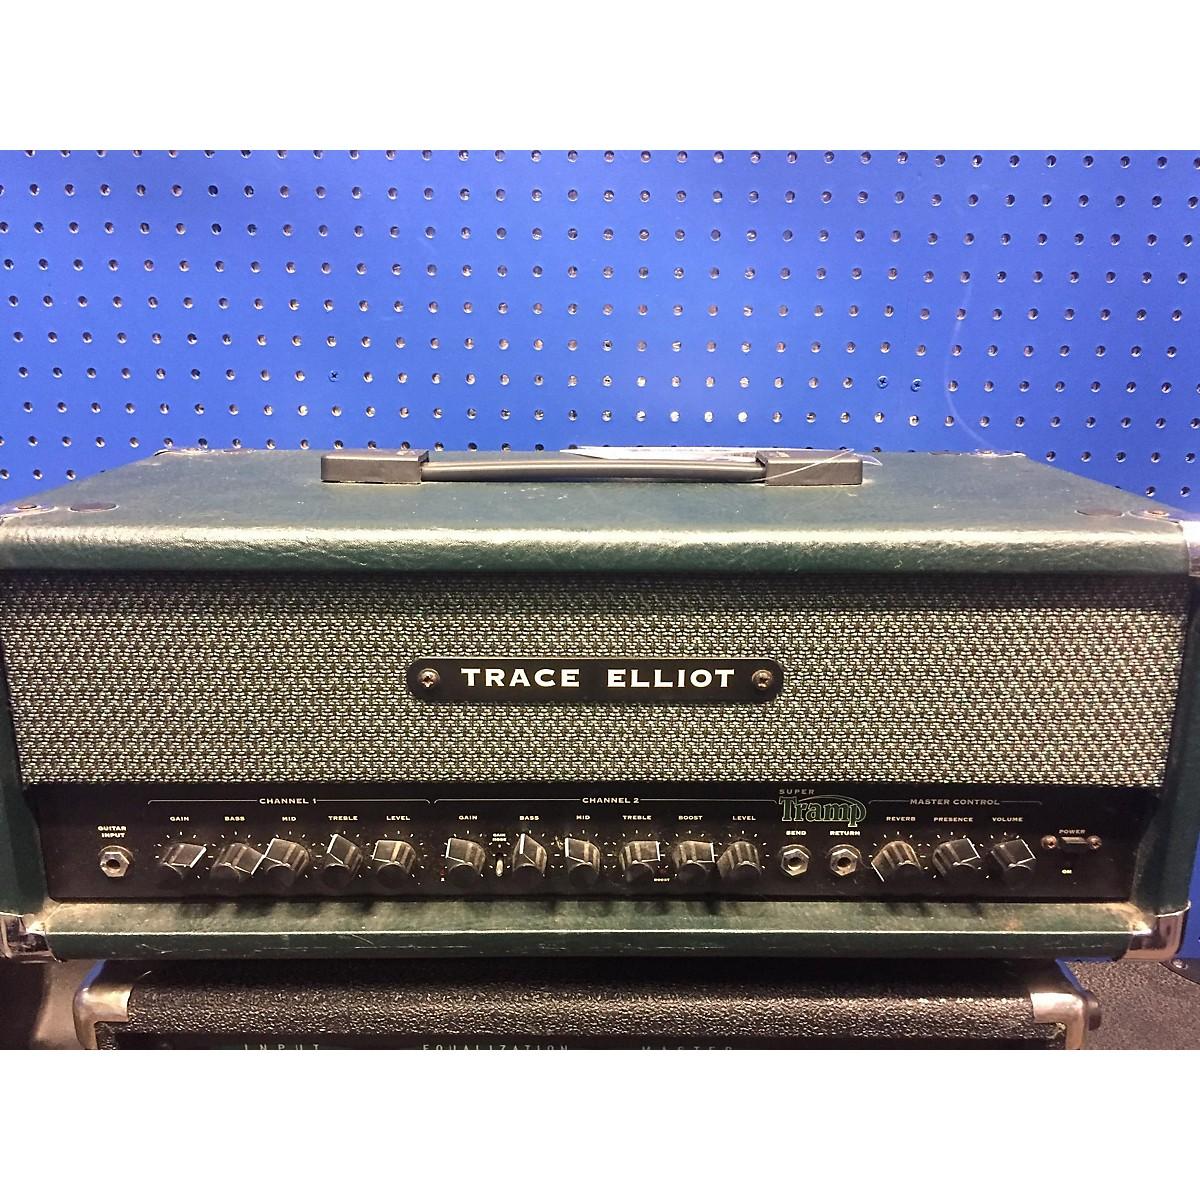 Trace Elliot SUPER TRAMP Solid State Guitar Amp Head